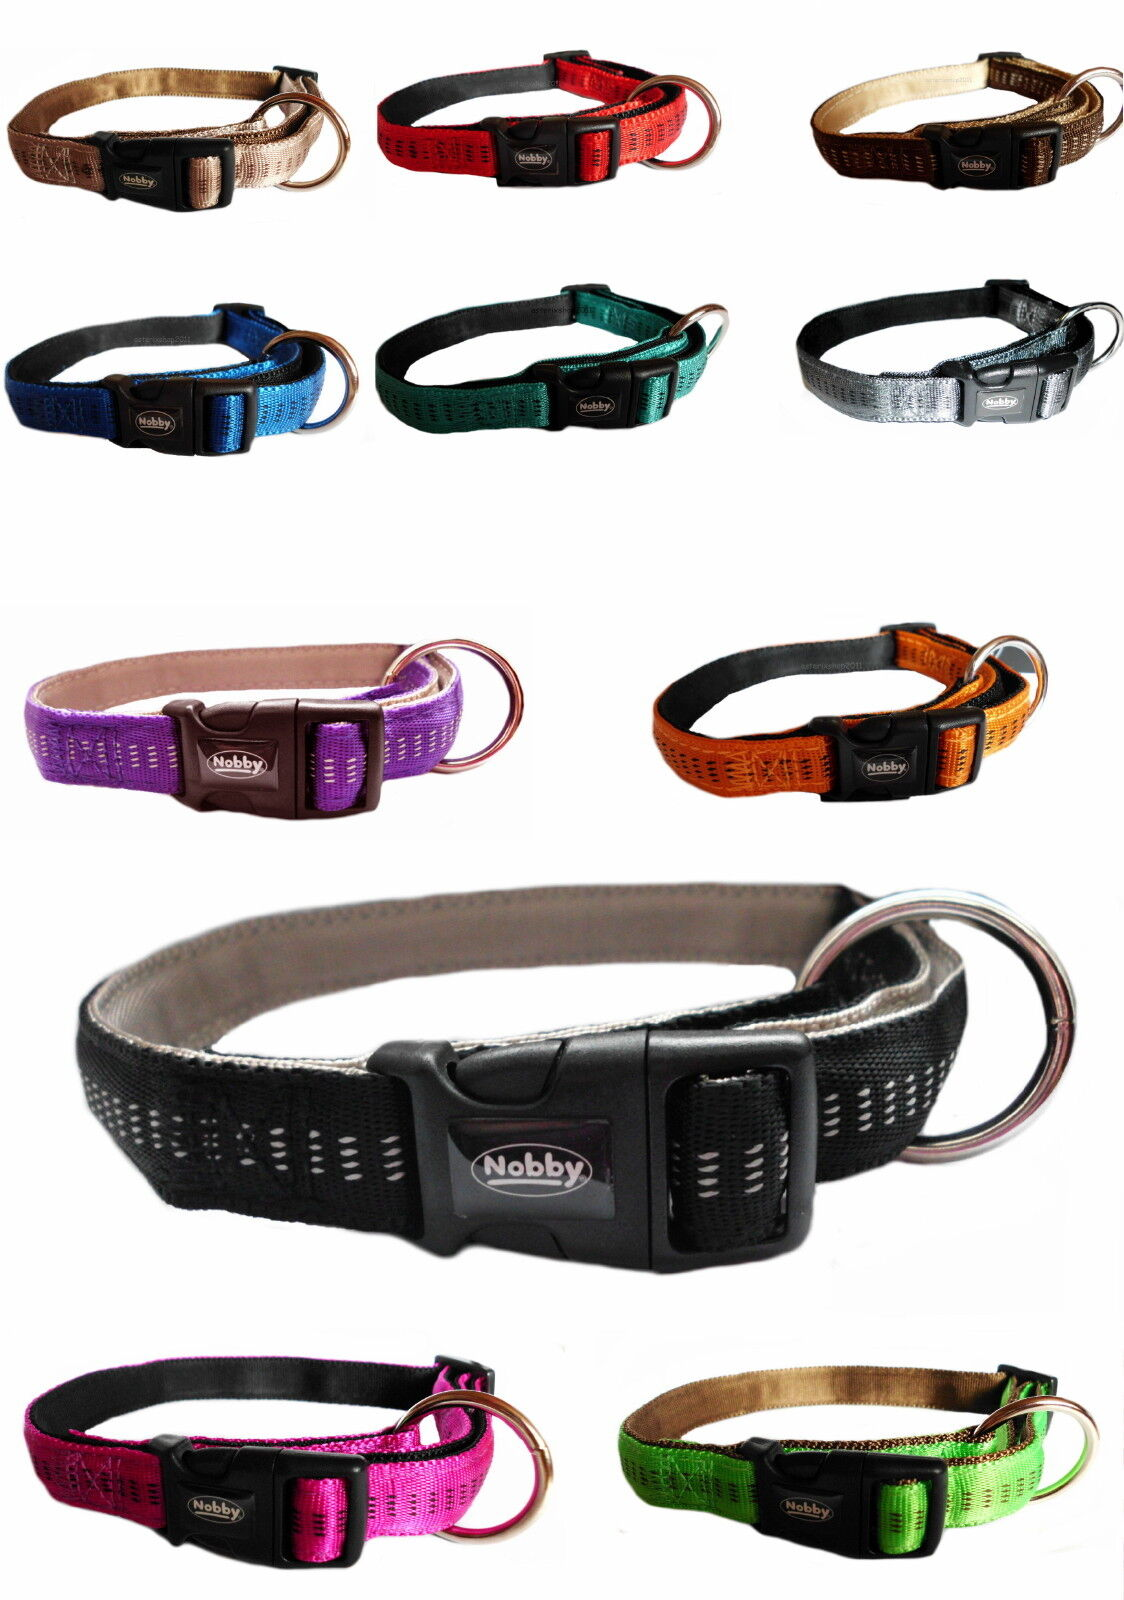 Nobby Halsband Hundehalsband Soft Grip xS S M L xL Nylon 11 Farben 5 Größen